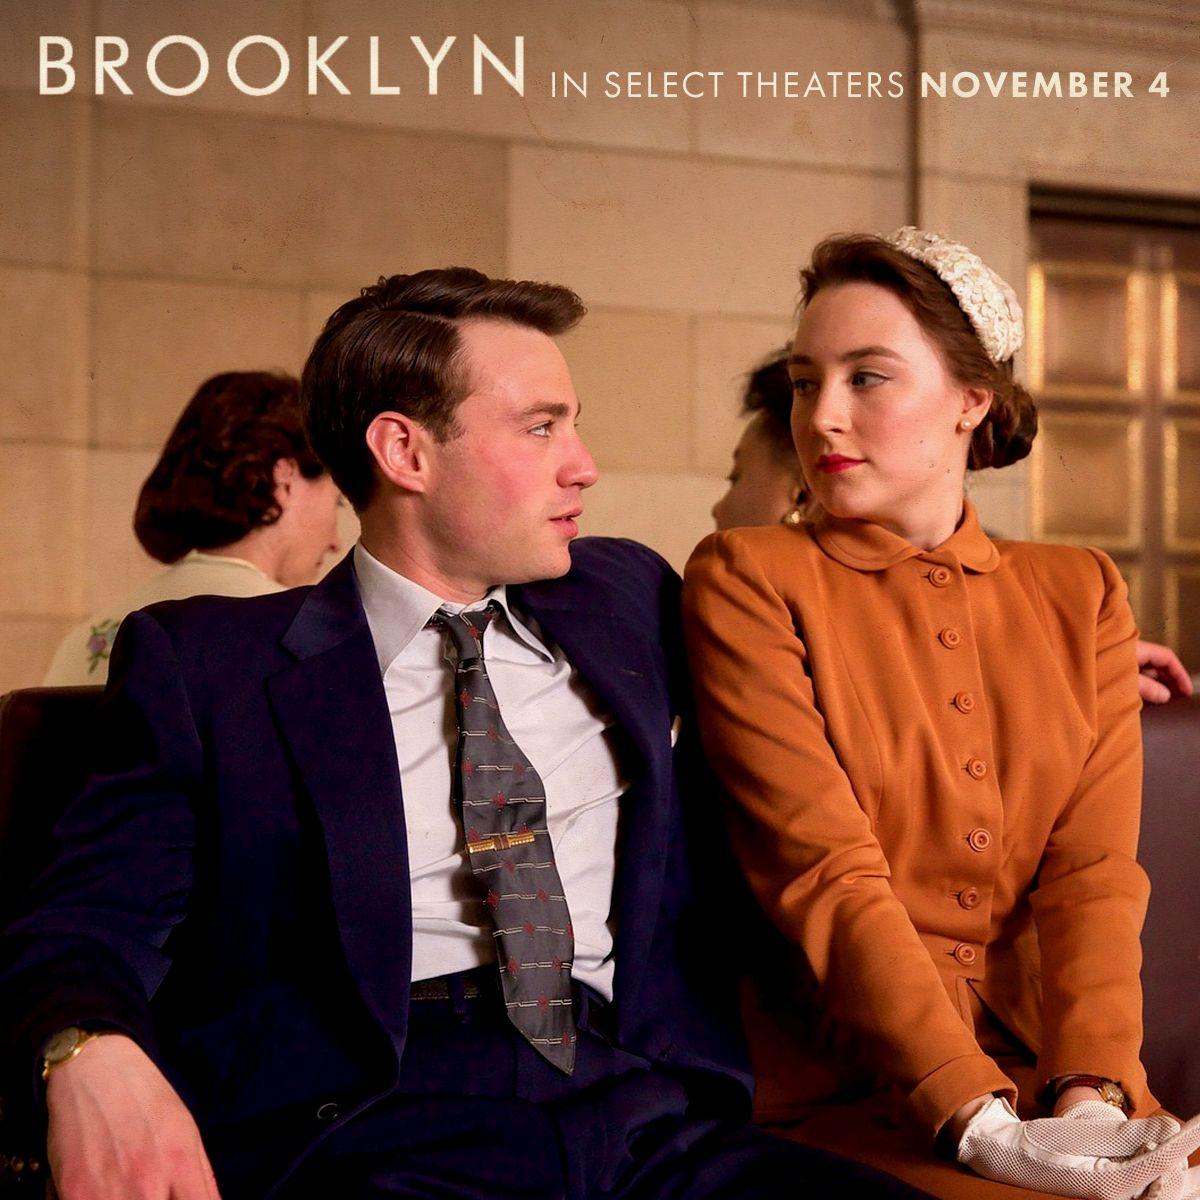 Review Brooklyn Movie BrooklynMovie Brooklyn film